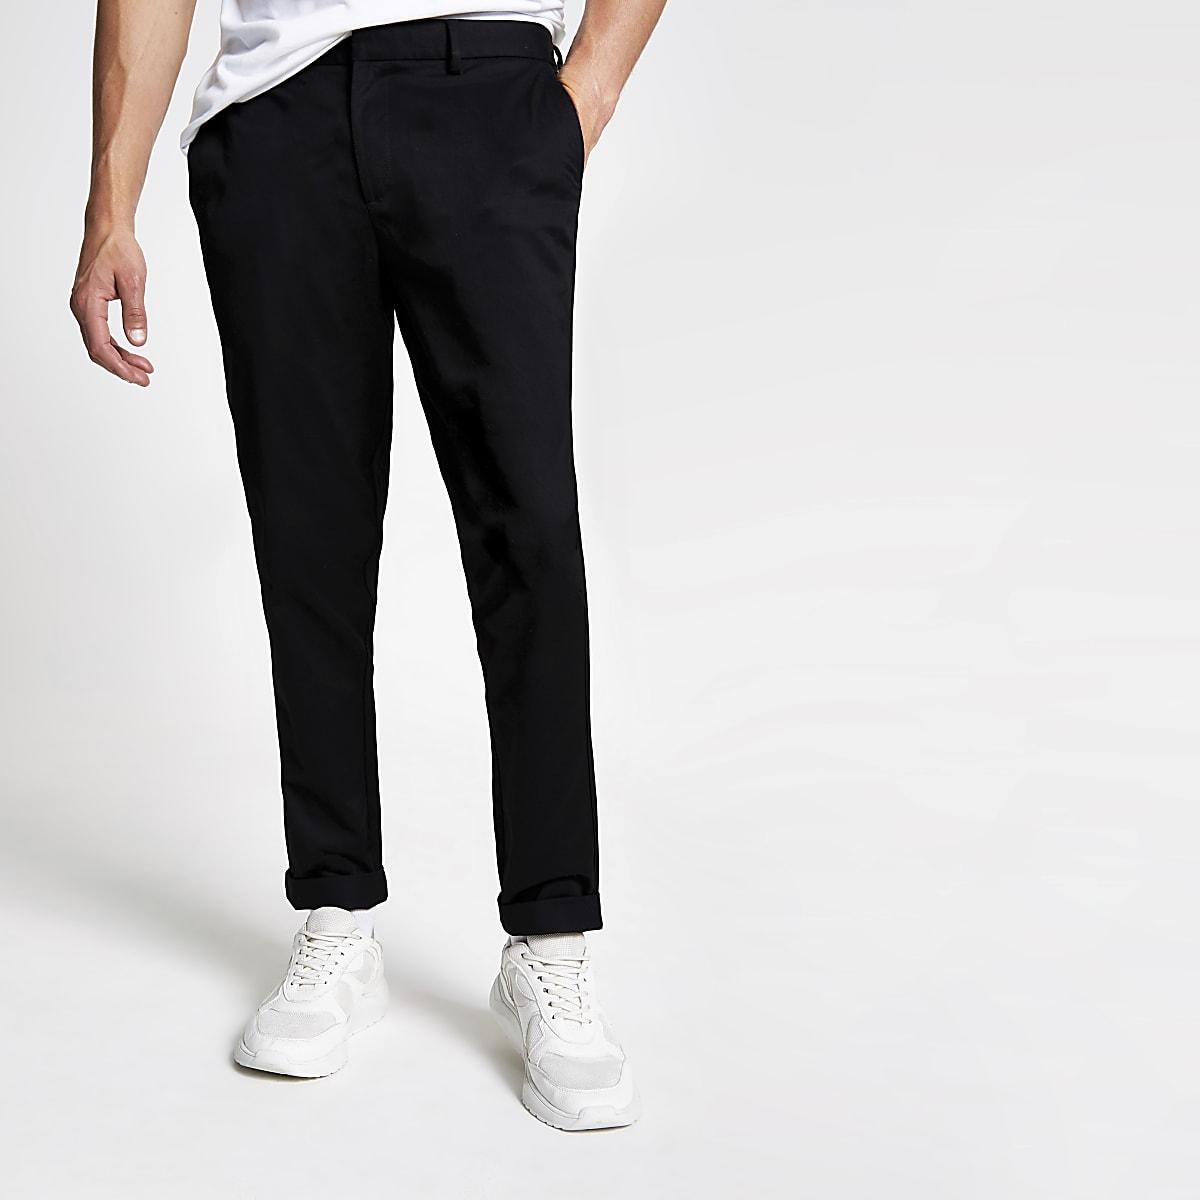 Black slim fit chino pants